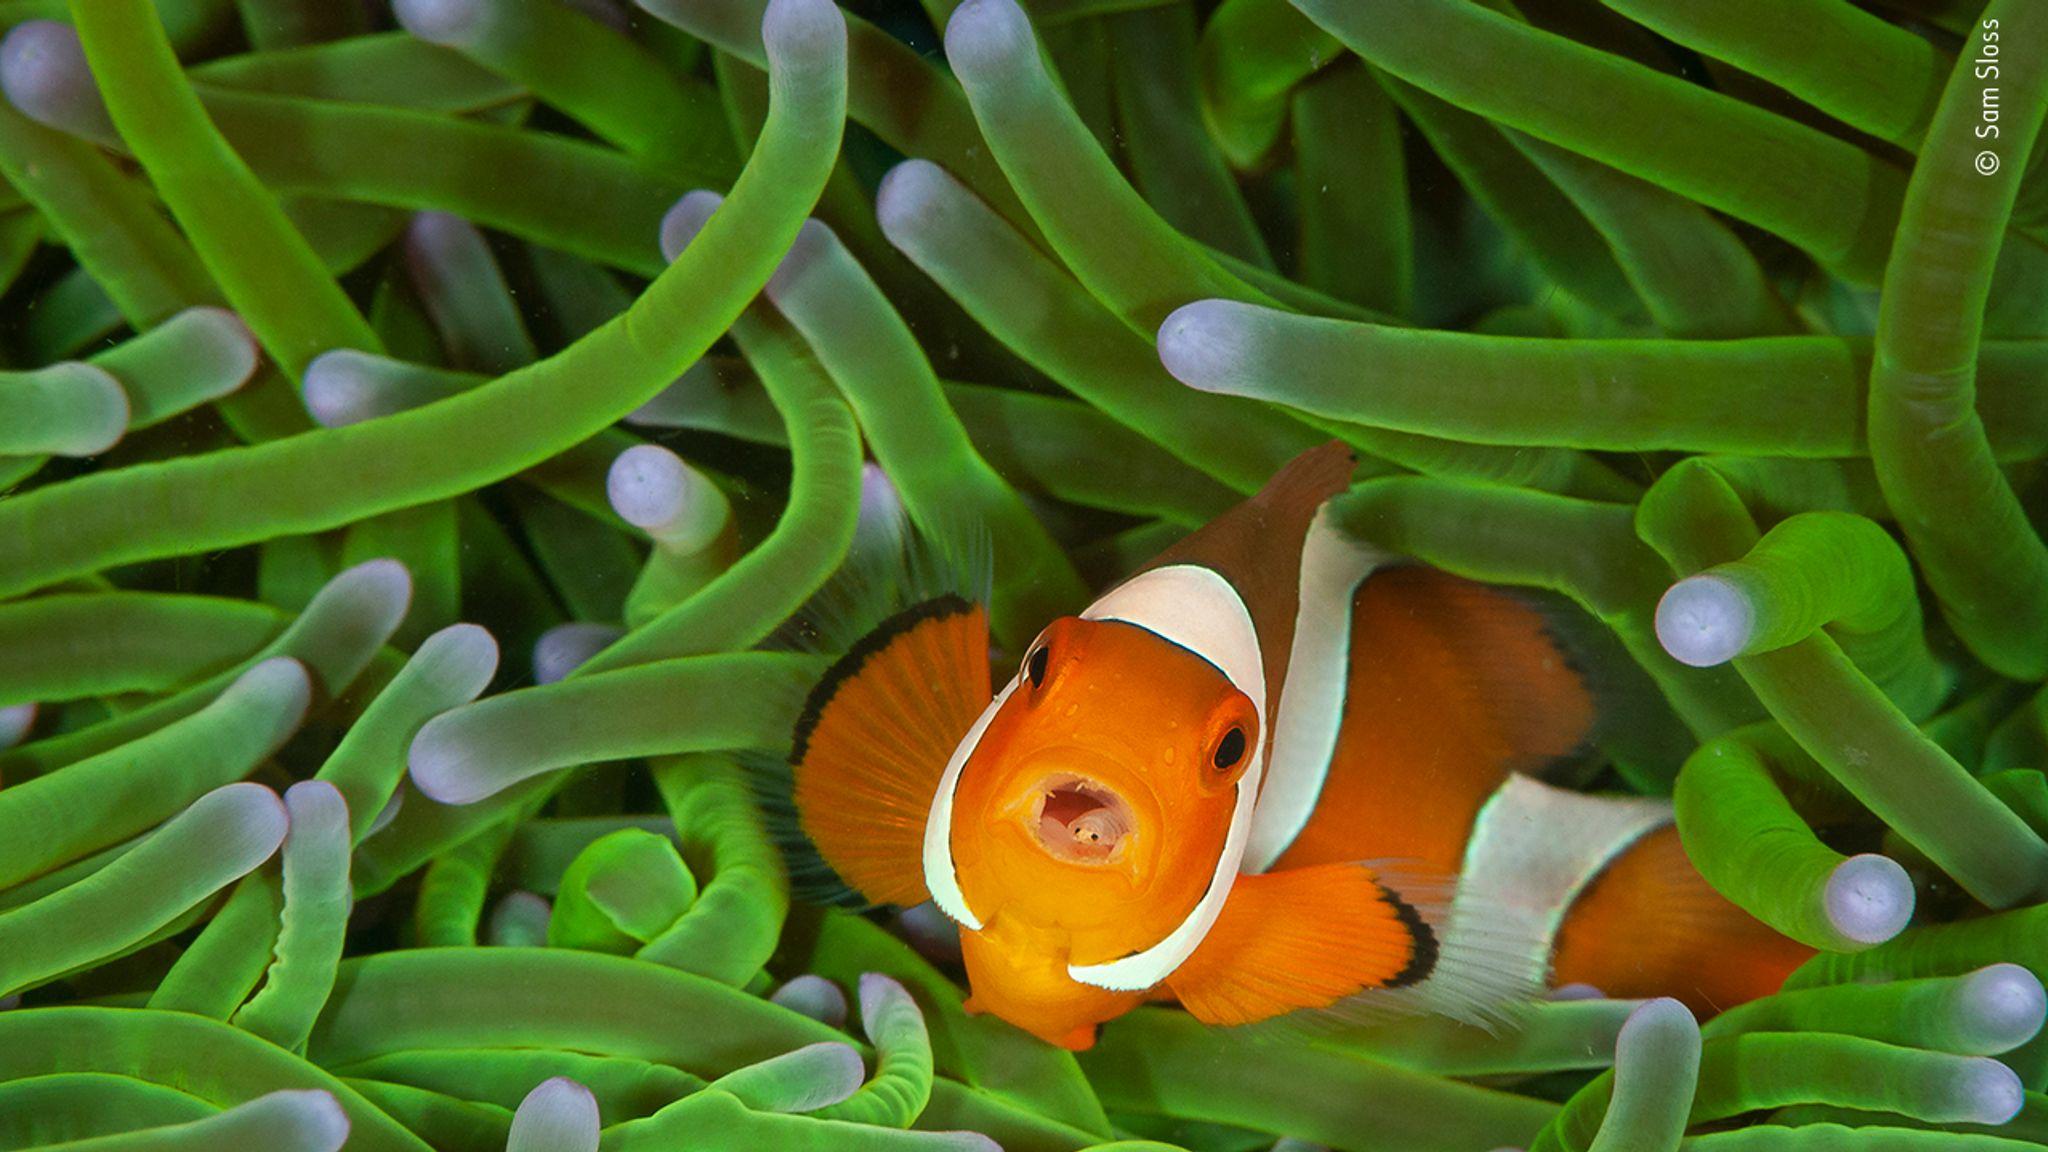 Clownfish with tongue isopod parasite (Amphiprion ocellaris with Cymothoa exigua) - Lembeh Strait, Sulawesi, Indonesia - © Sam Sloss, Wildlife Photographer of the Year 2020